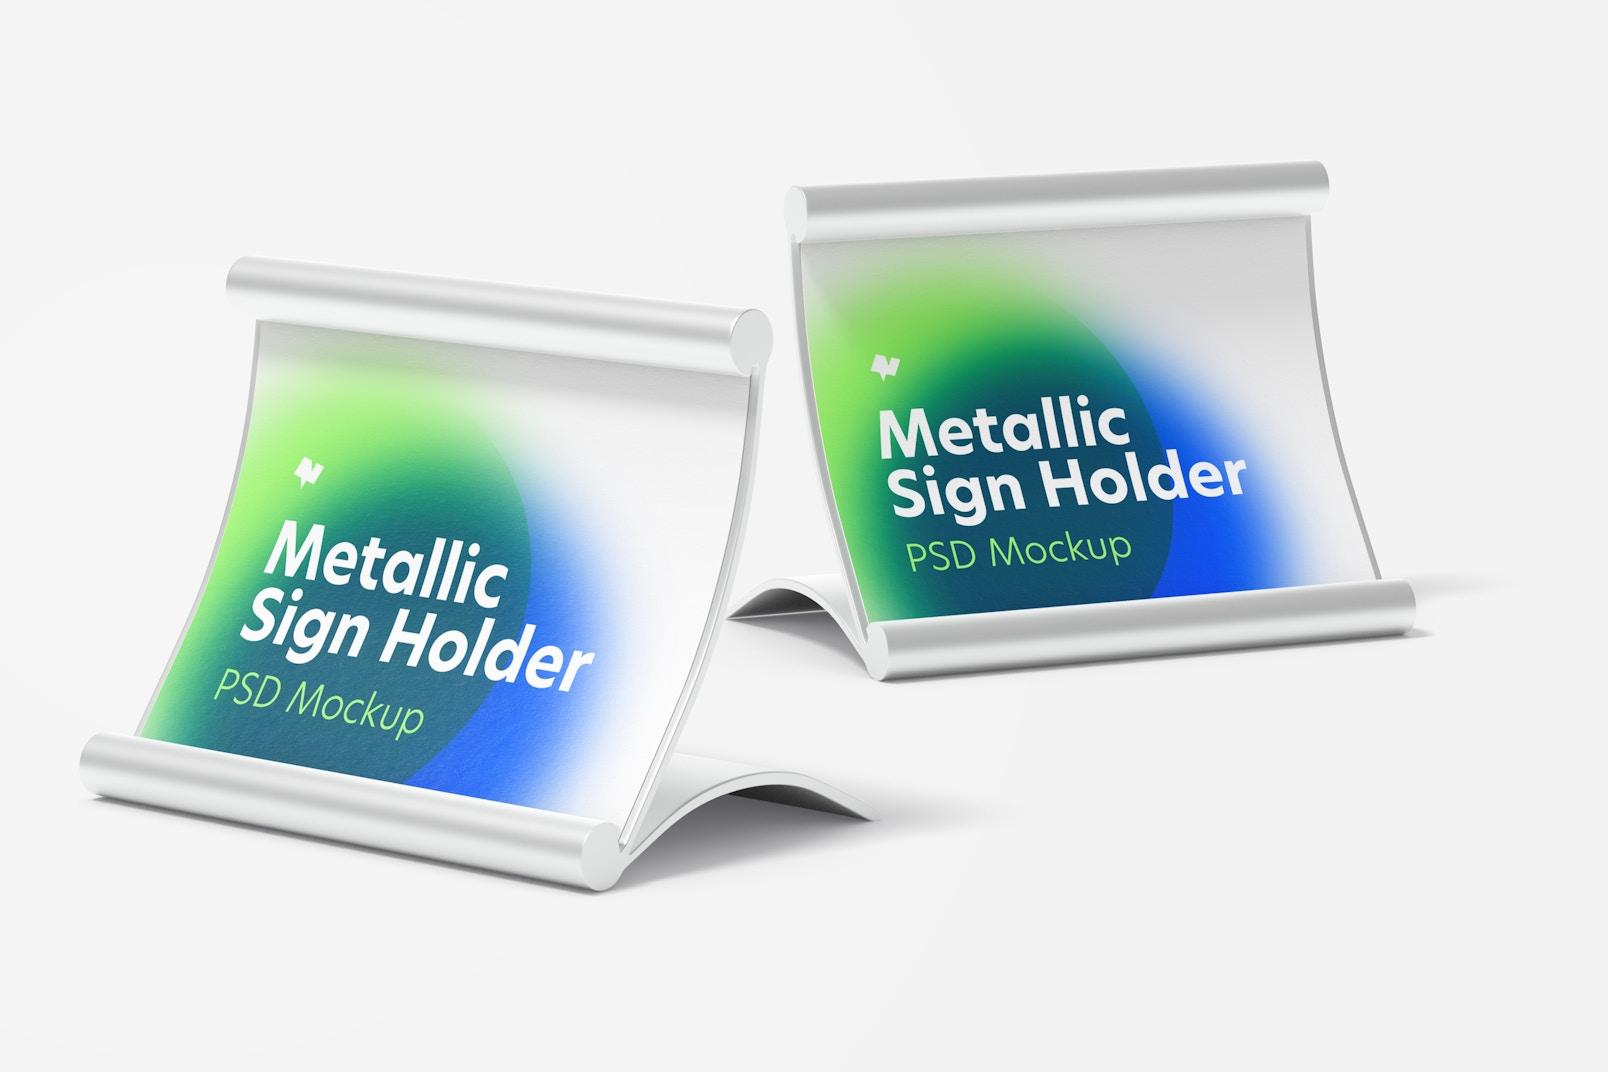 Metallic Table Sign Holders Mockup, Perspective